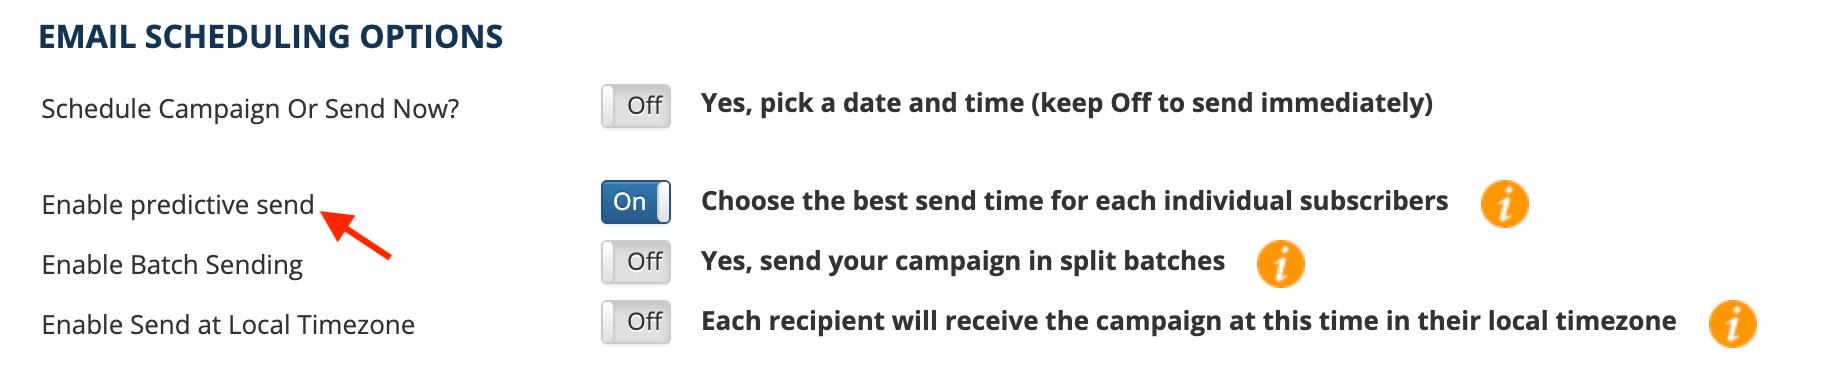 email scheduling predictive send